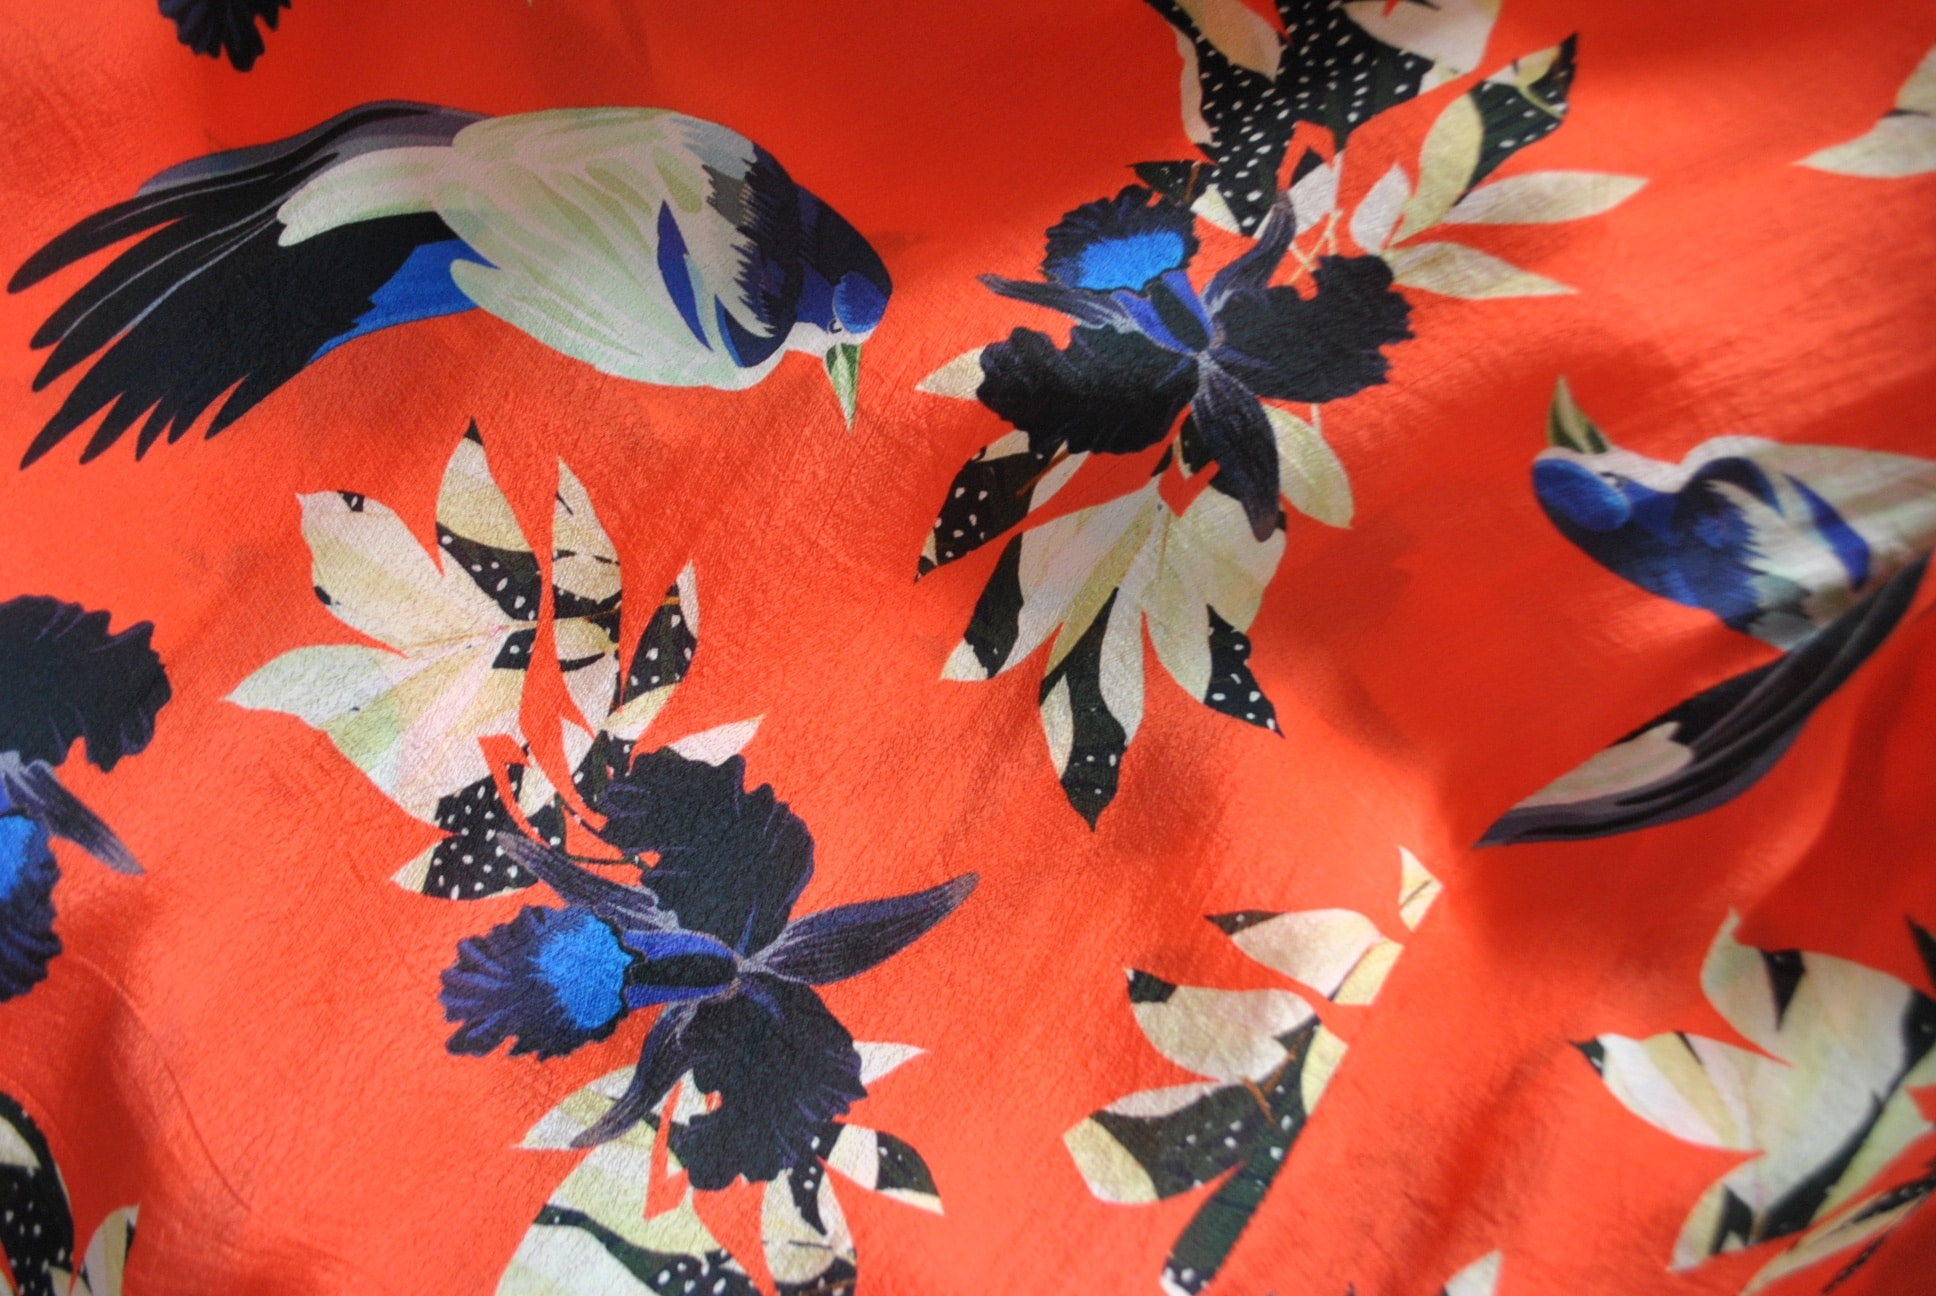 Pyrus-bird-print-dress